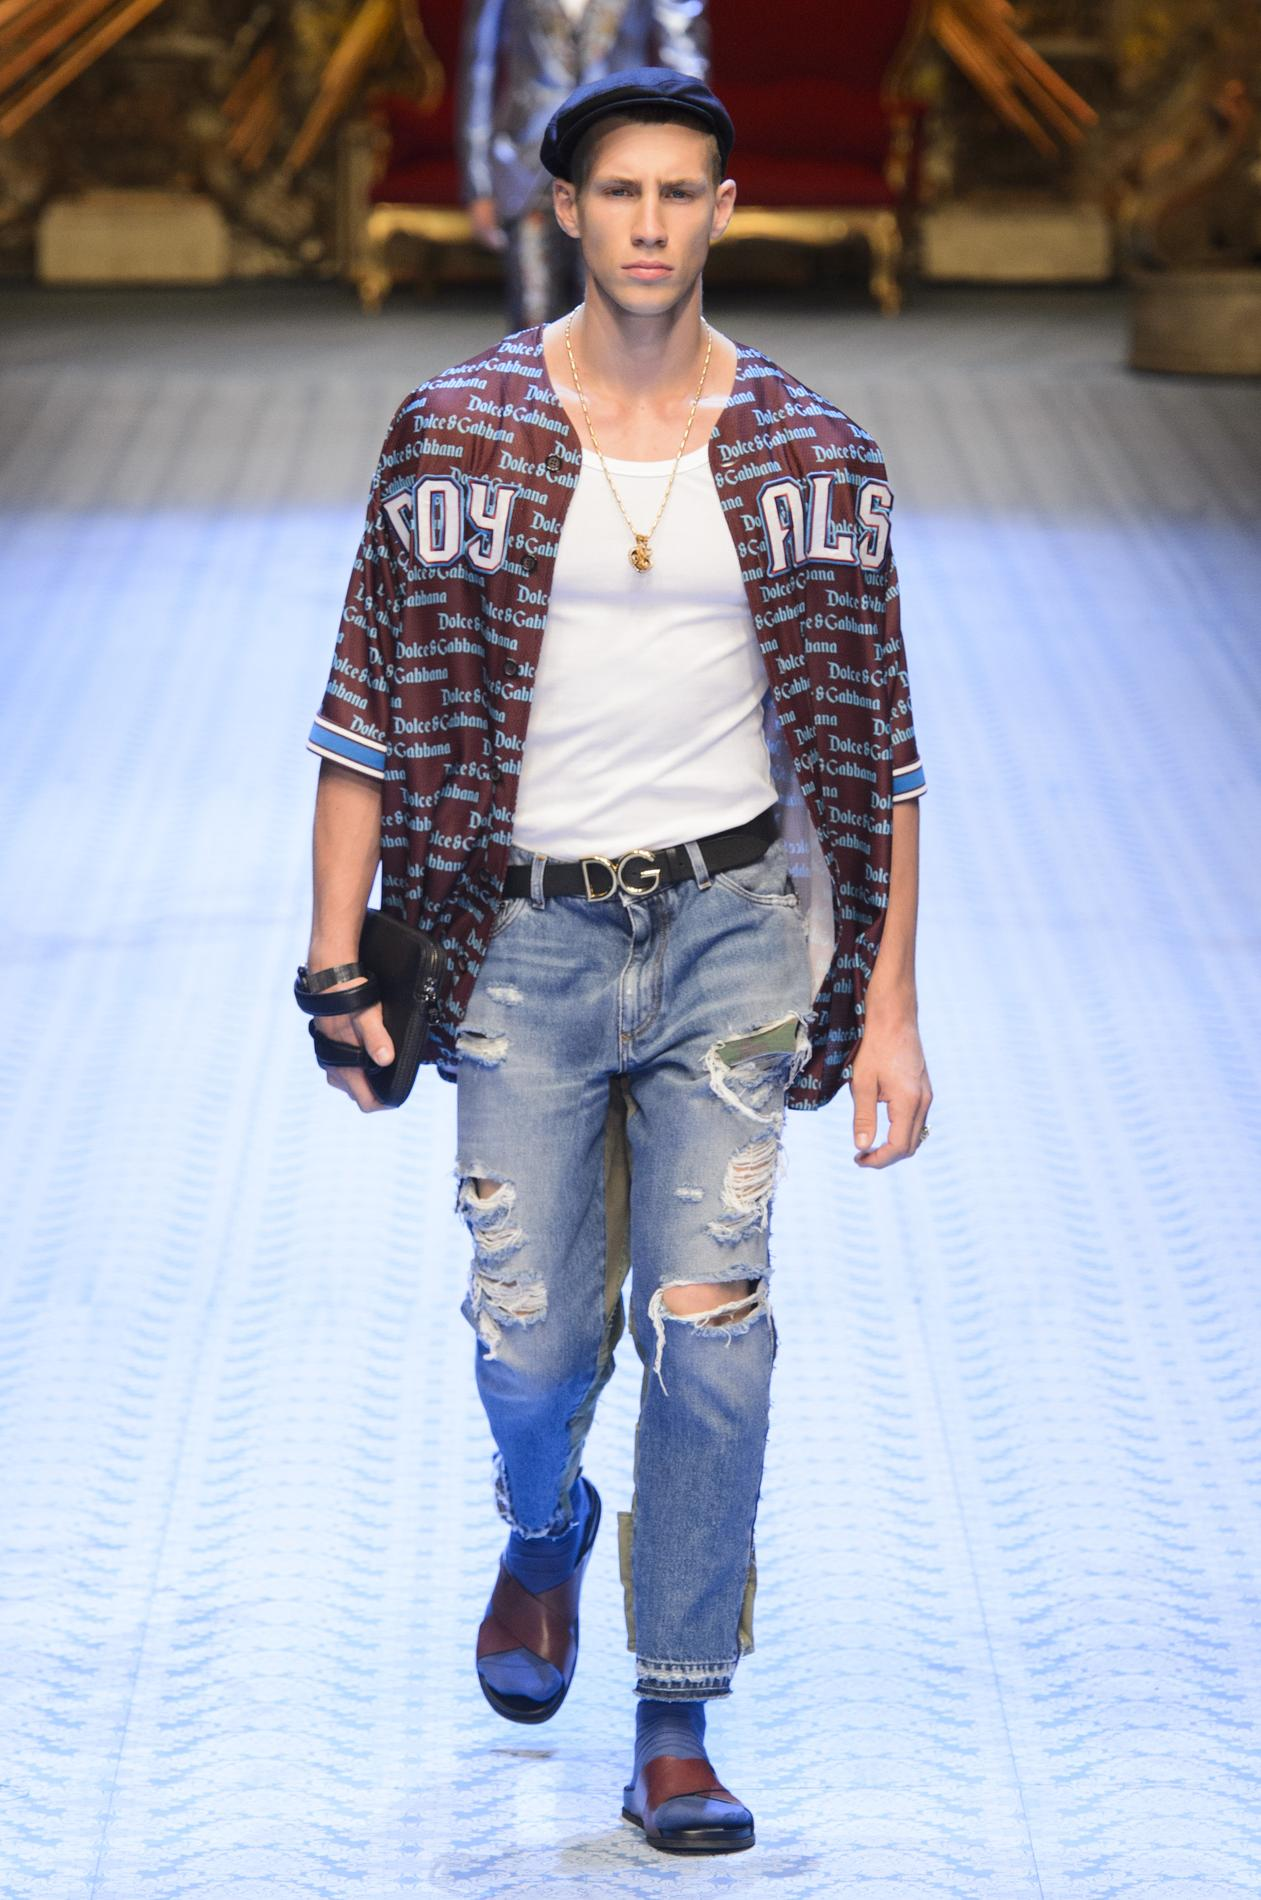 fa04998f Monica Bellucci défile à Milan pour Dolce & Gabbana - Madame Figaro